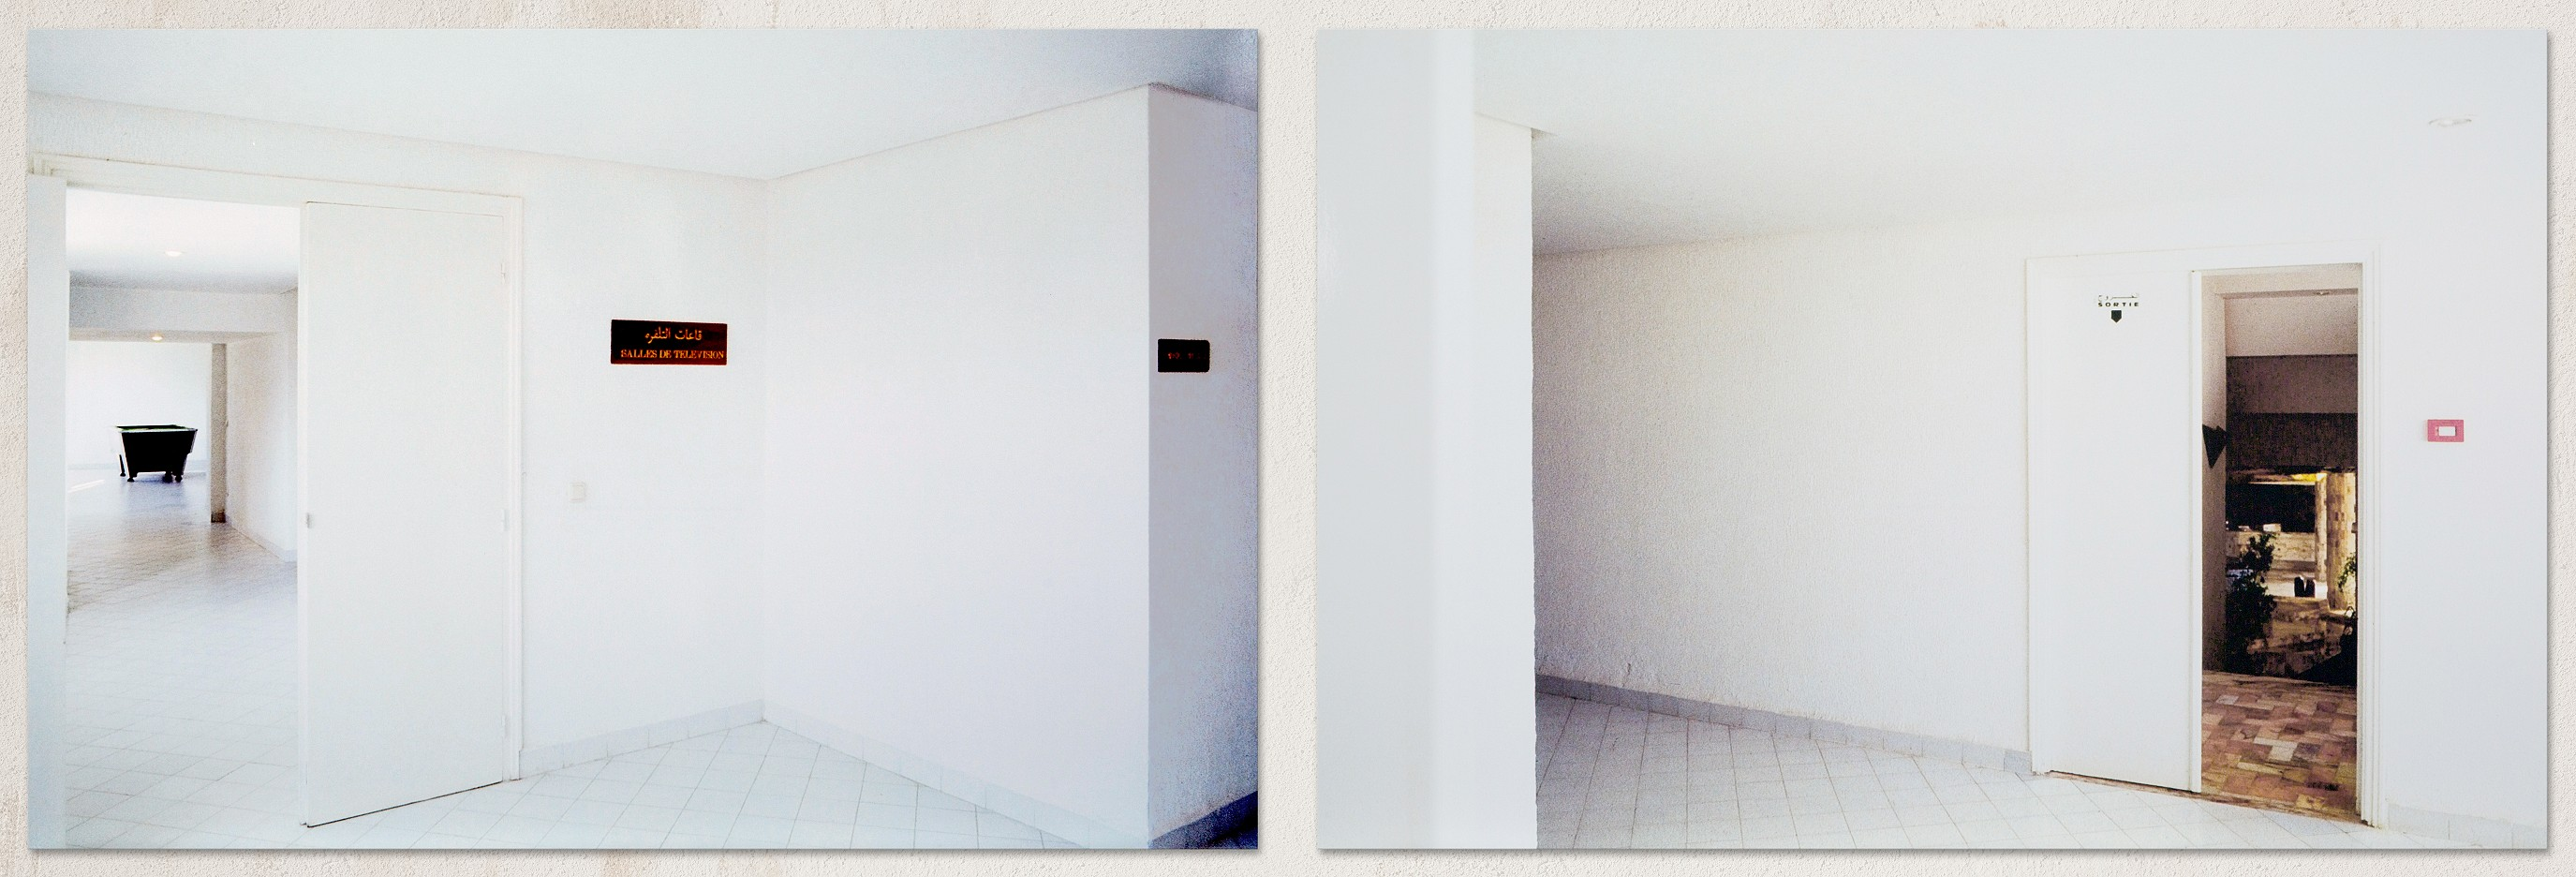 raum - Diptychon - Tafel 3